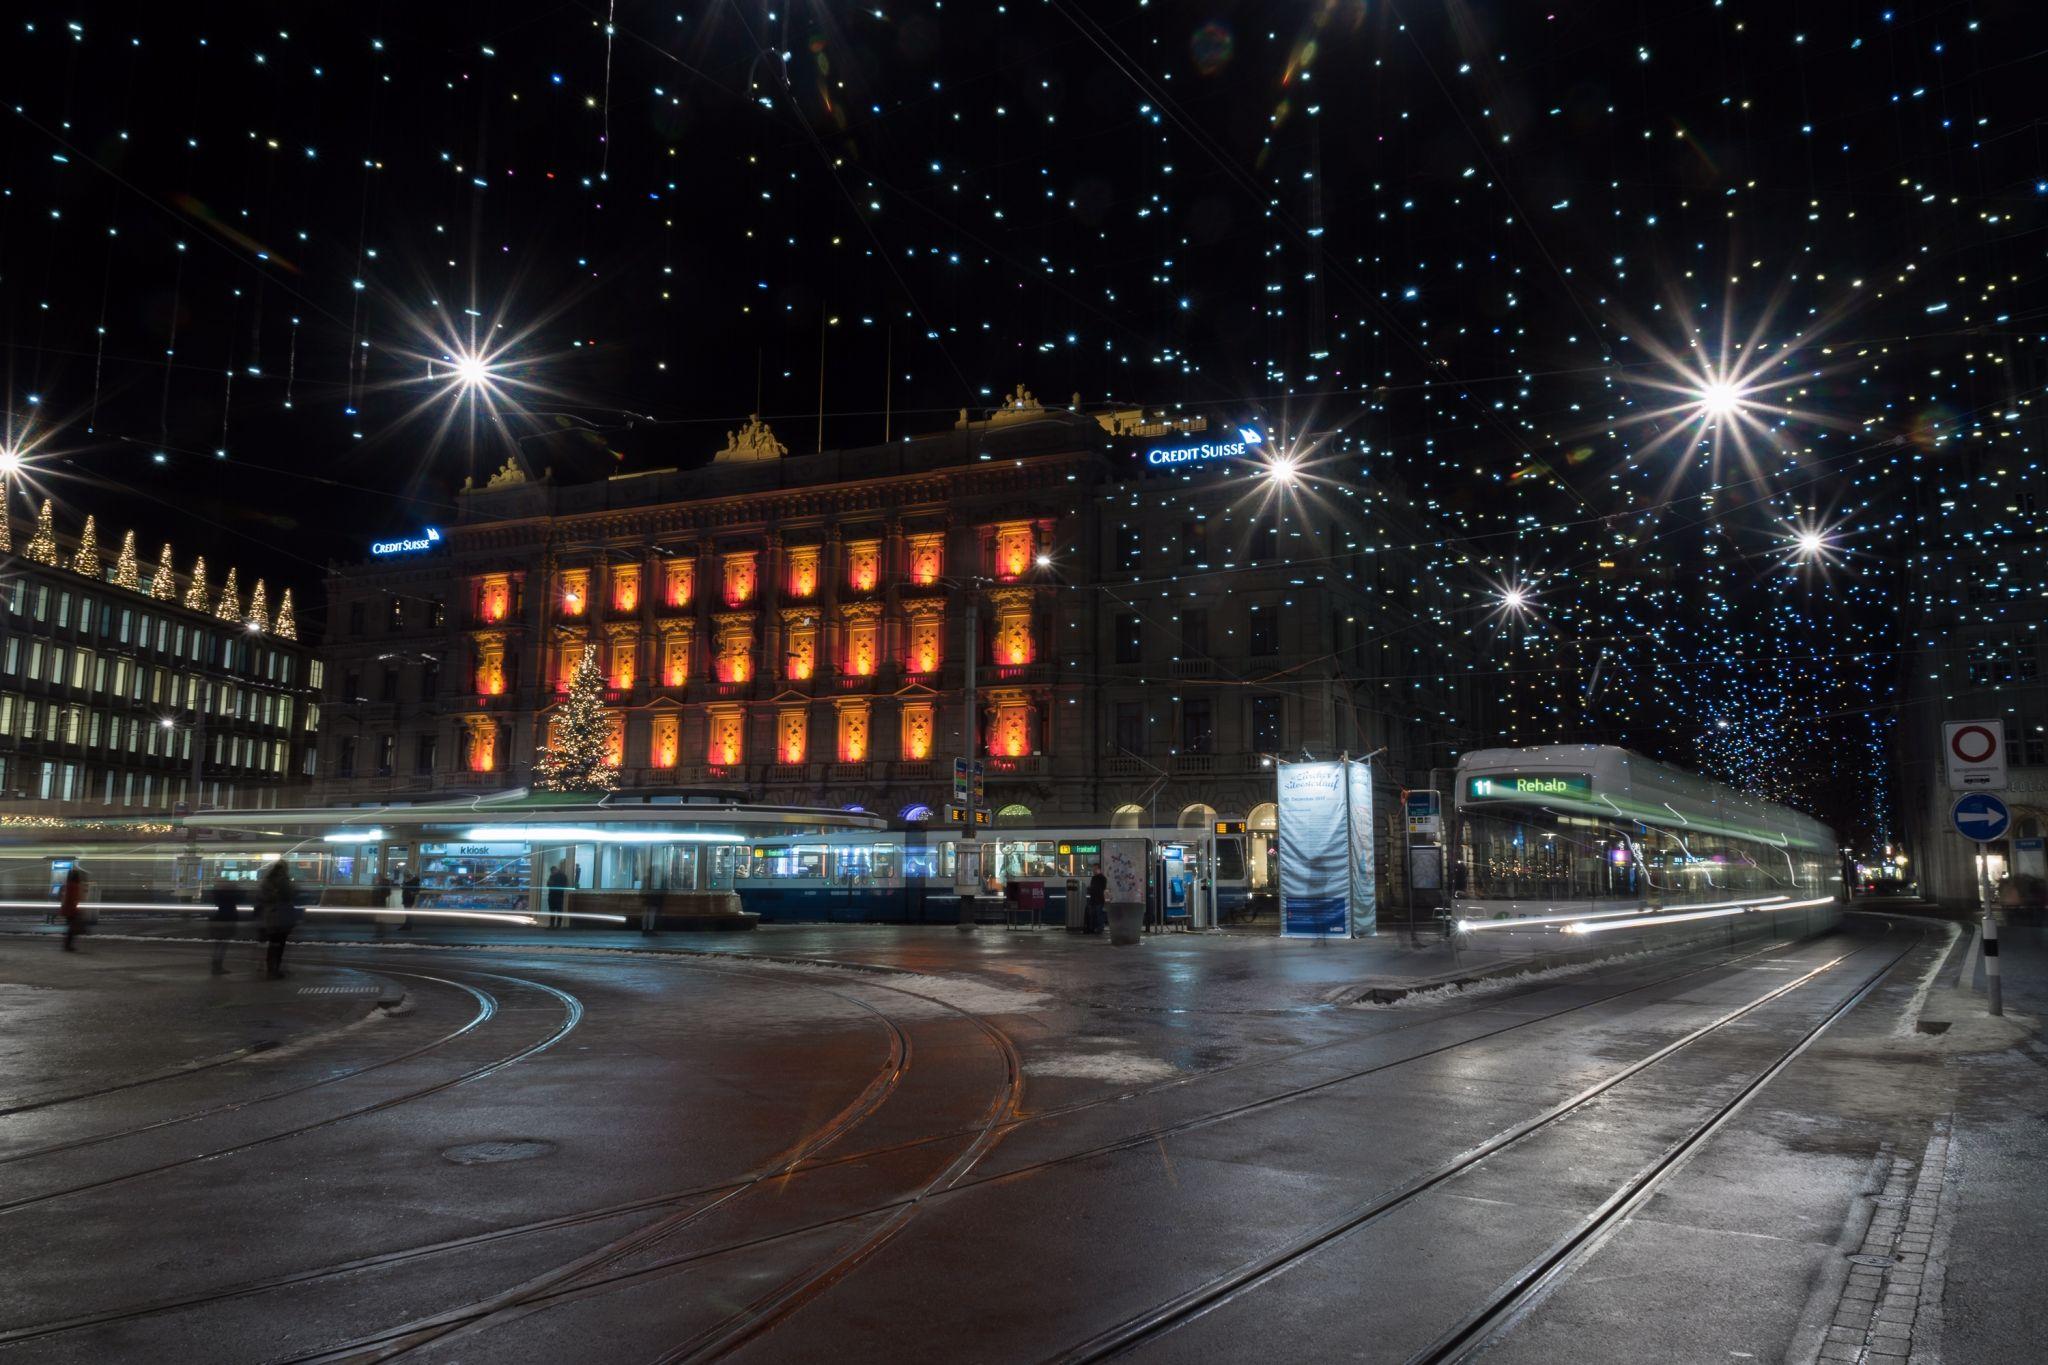 Paradeplatz, Switzerland